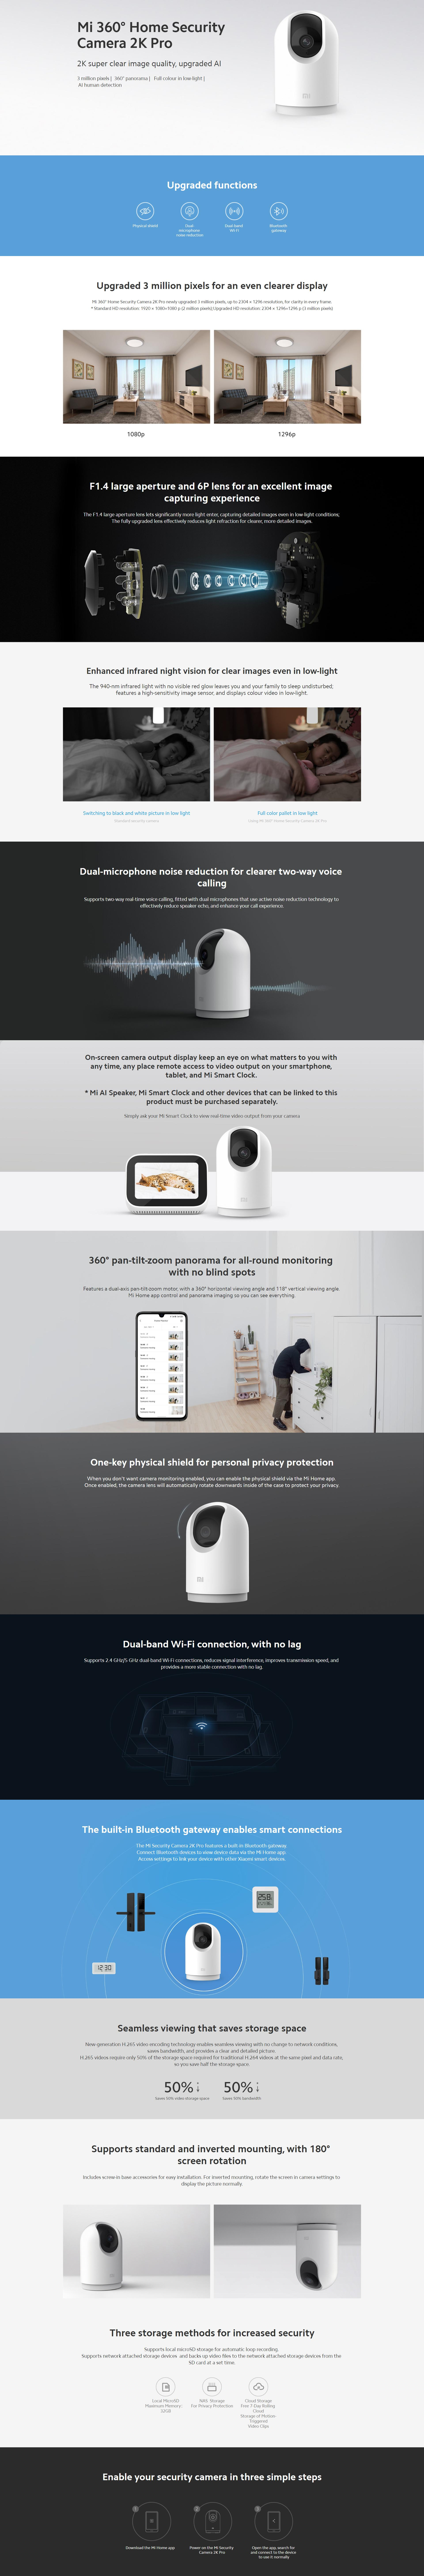 Xiaomi nadzorna kamera Mi home Security 2K Pro